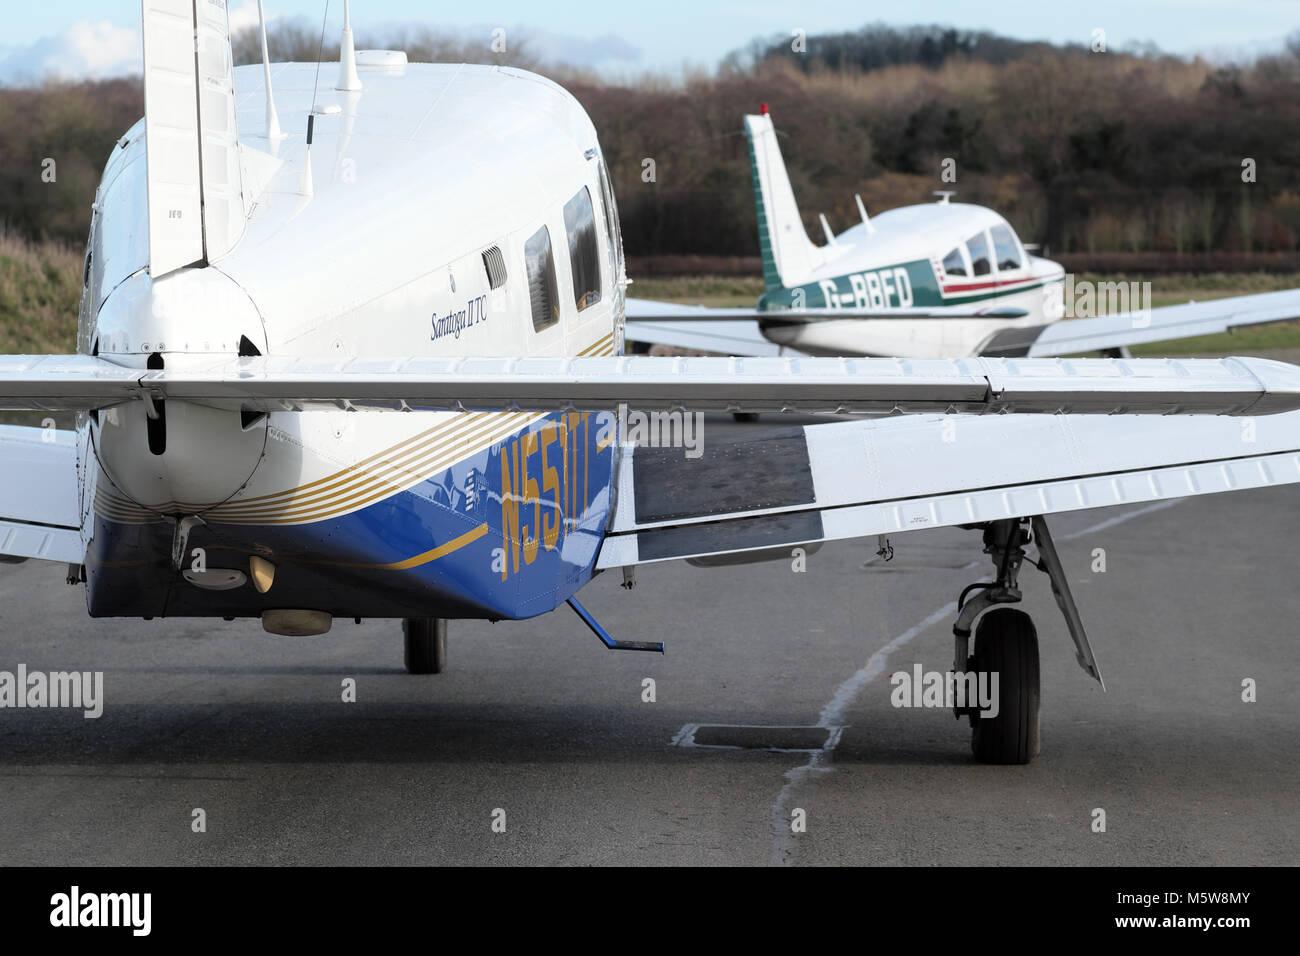 General aviation busy at airfield Piper Pa-32 Saratoga and behind Piper Pa-28 Cherokee aircraft taxying at a UK - Stock Image